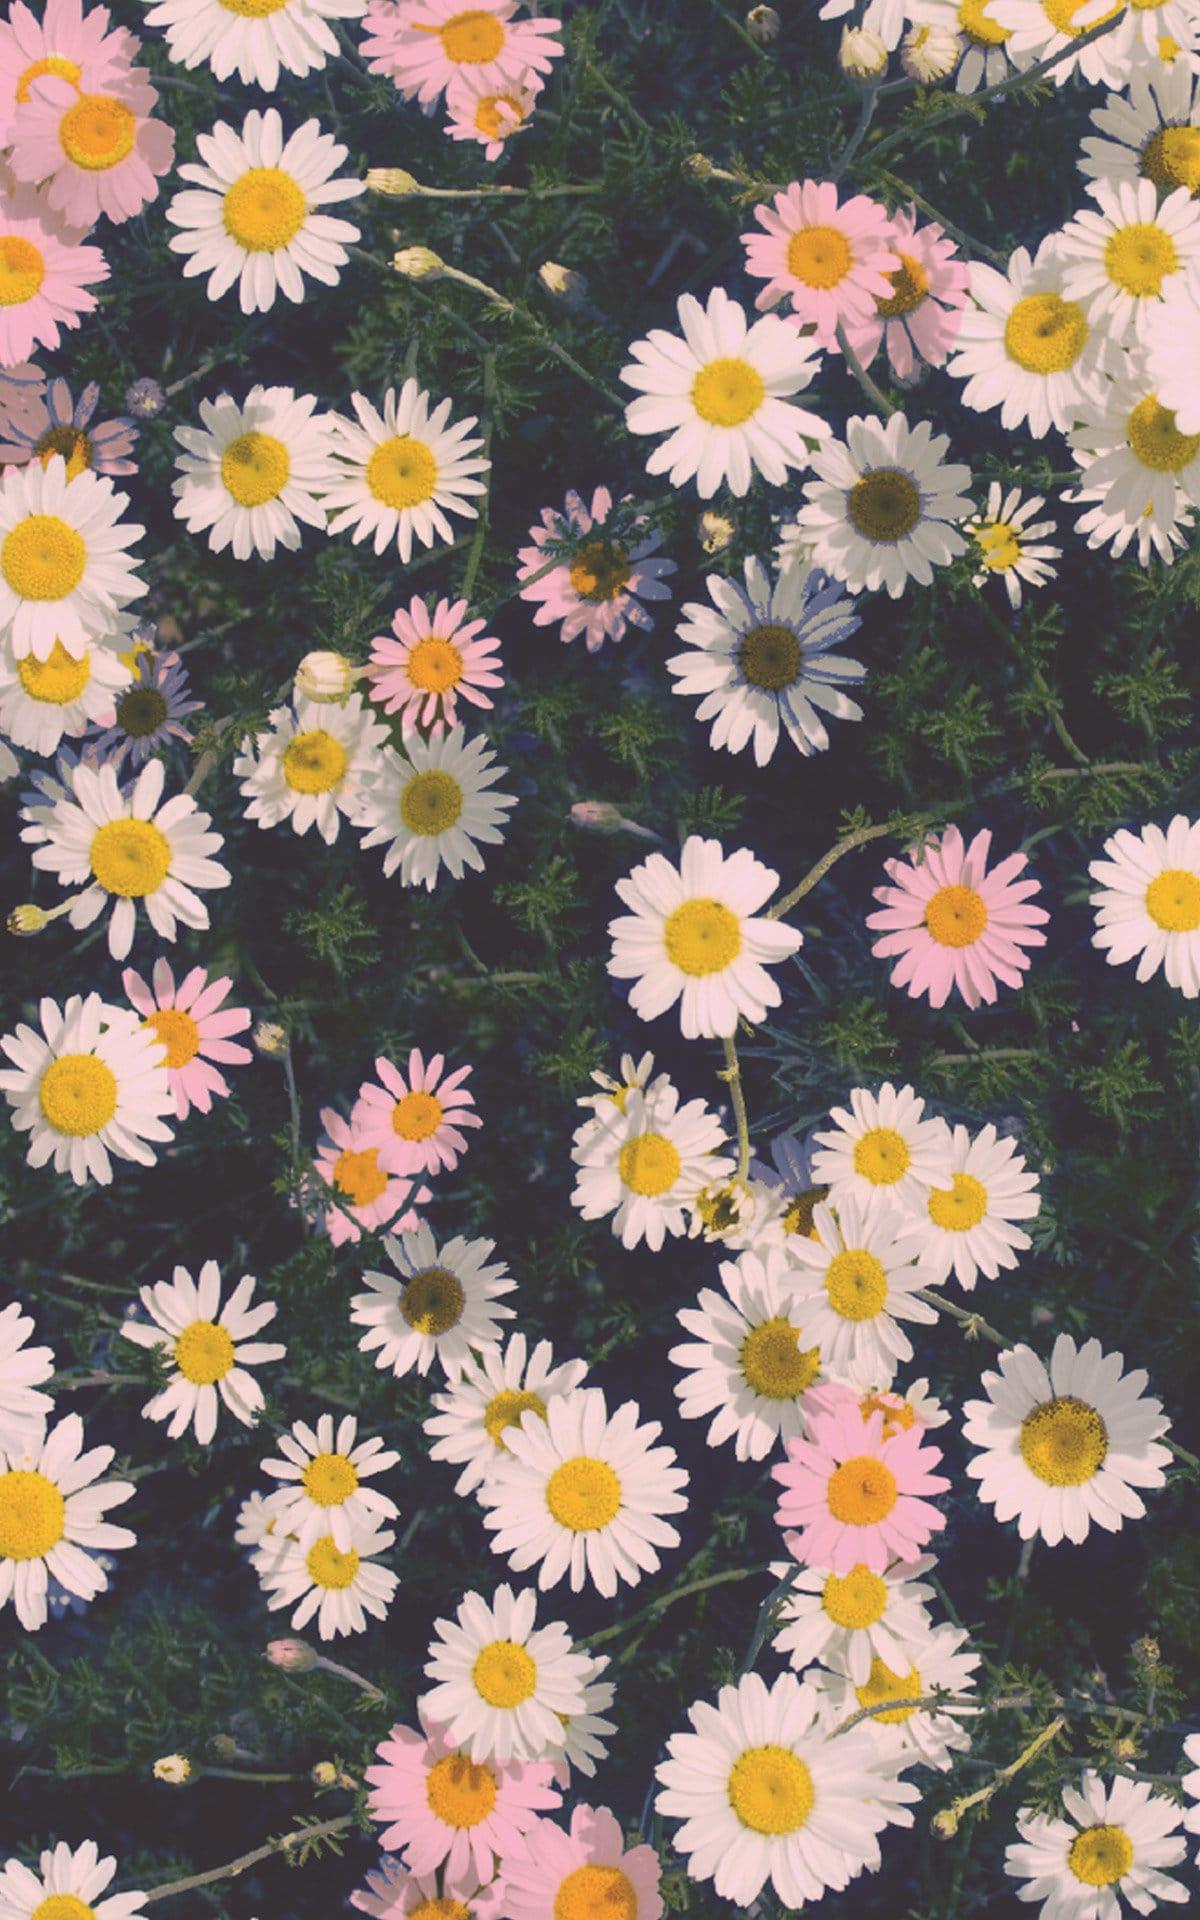 Flowers Image, Flowers Wallpaper iPhone